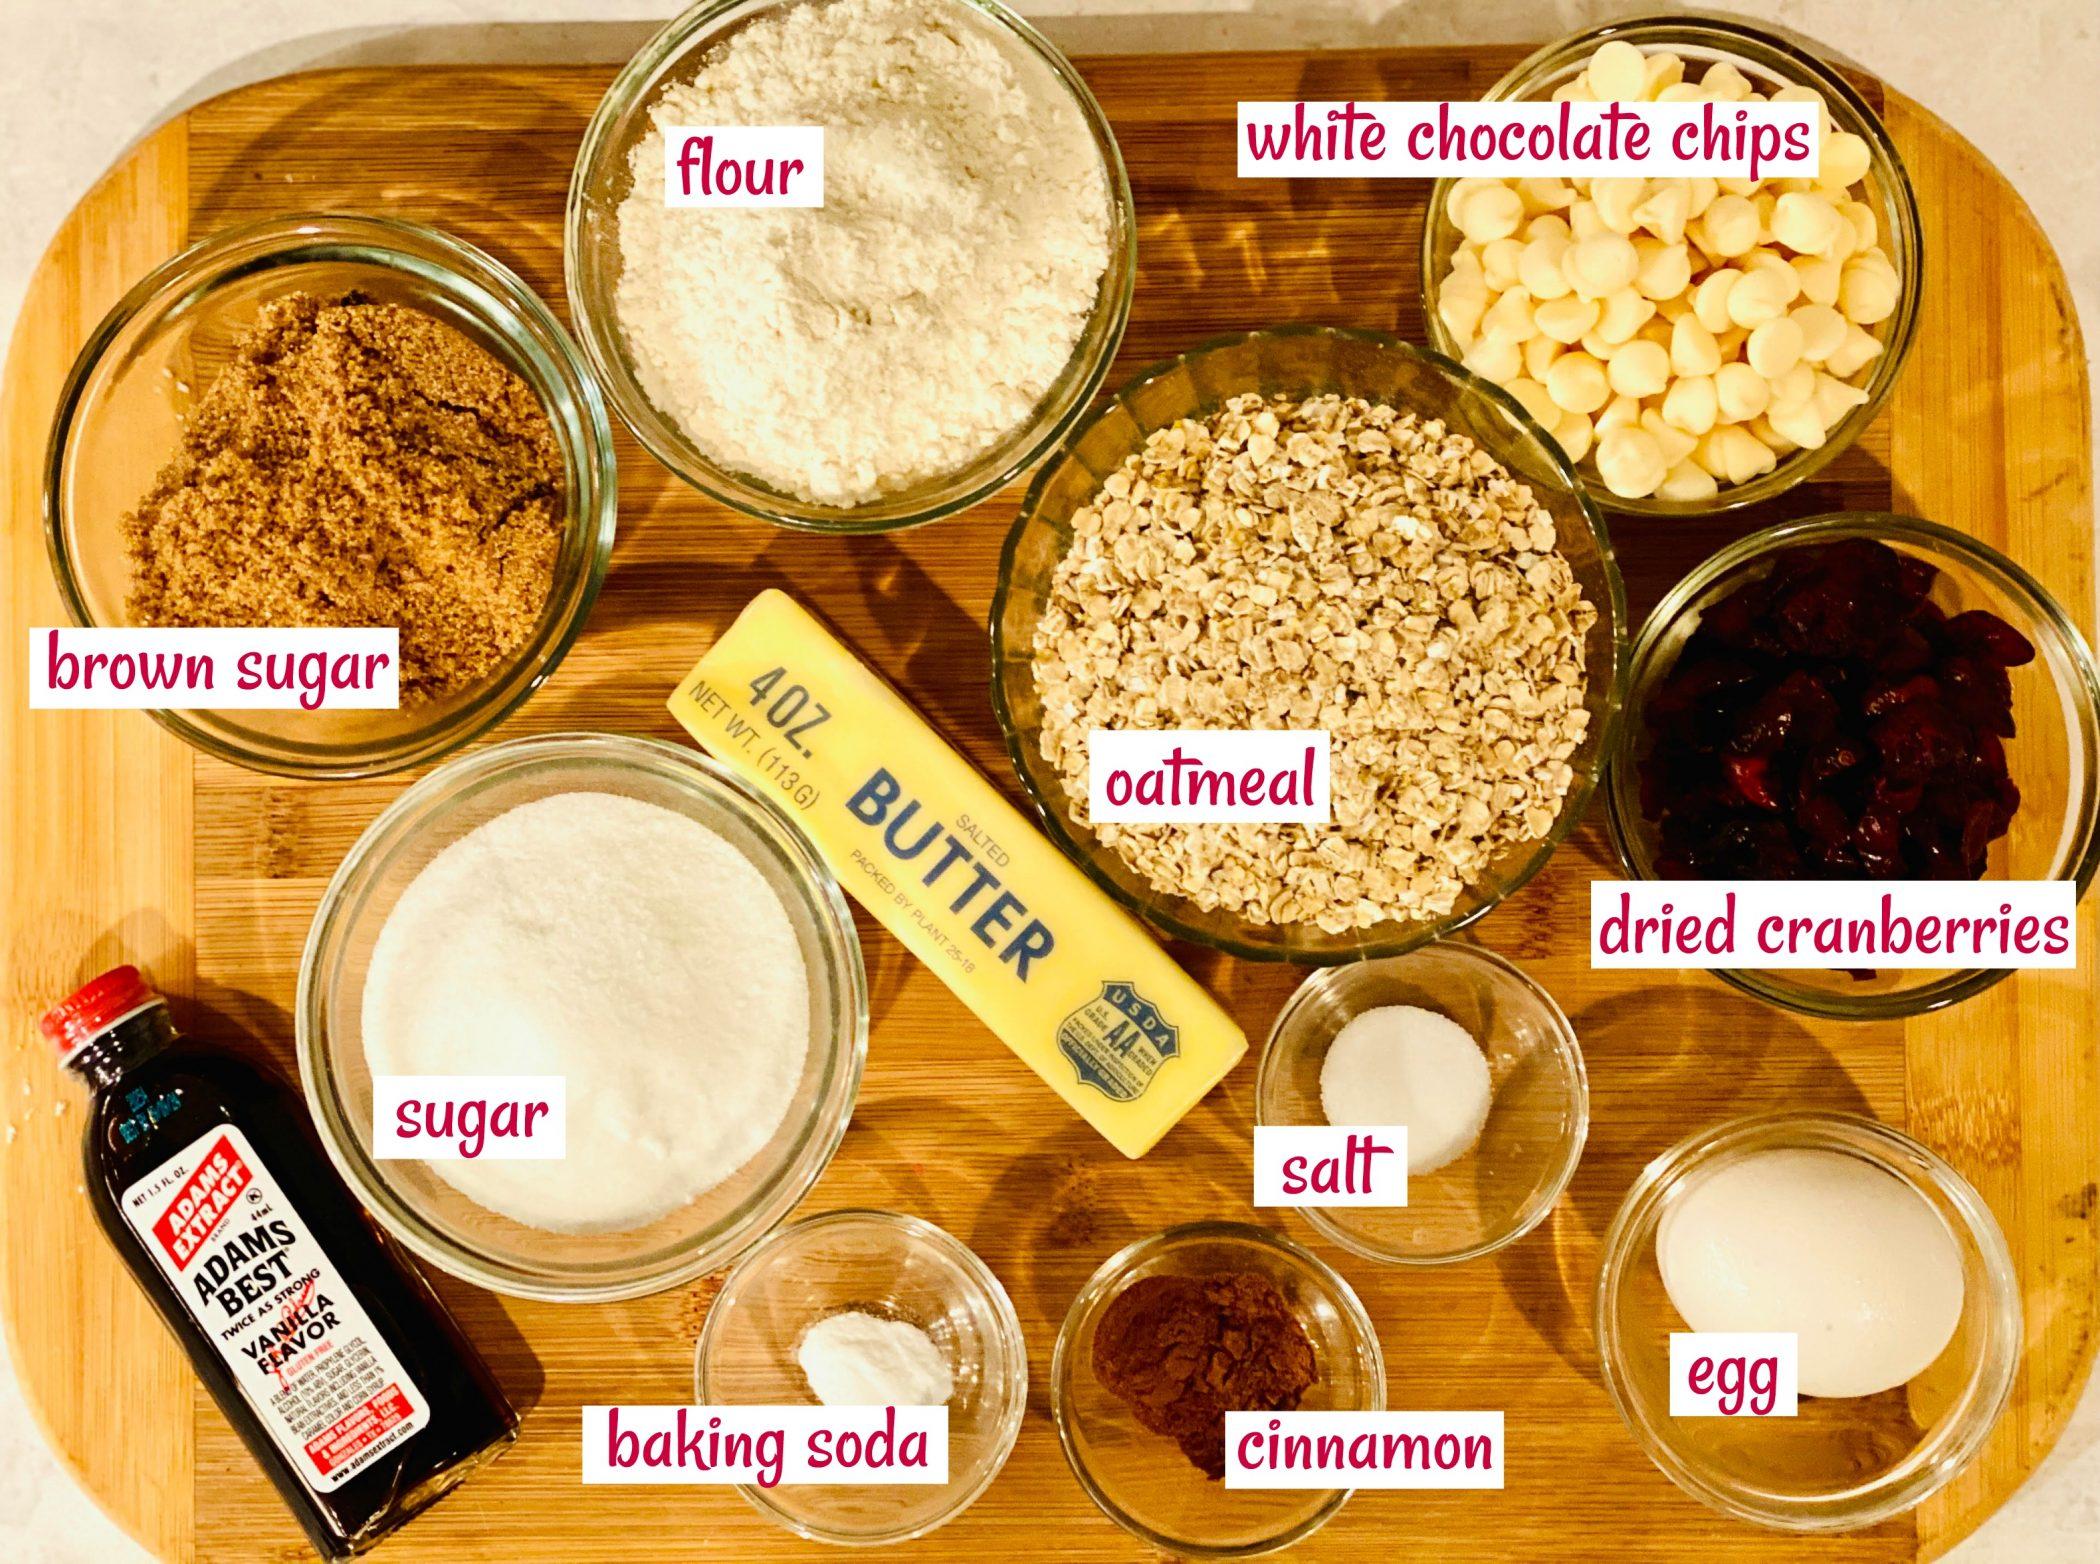 ingredients to make oatmeal cookies